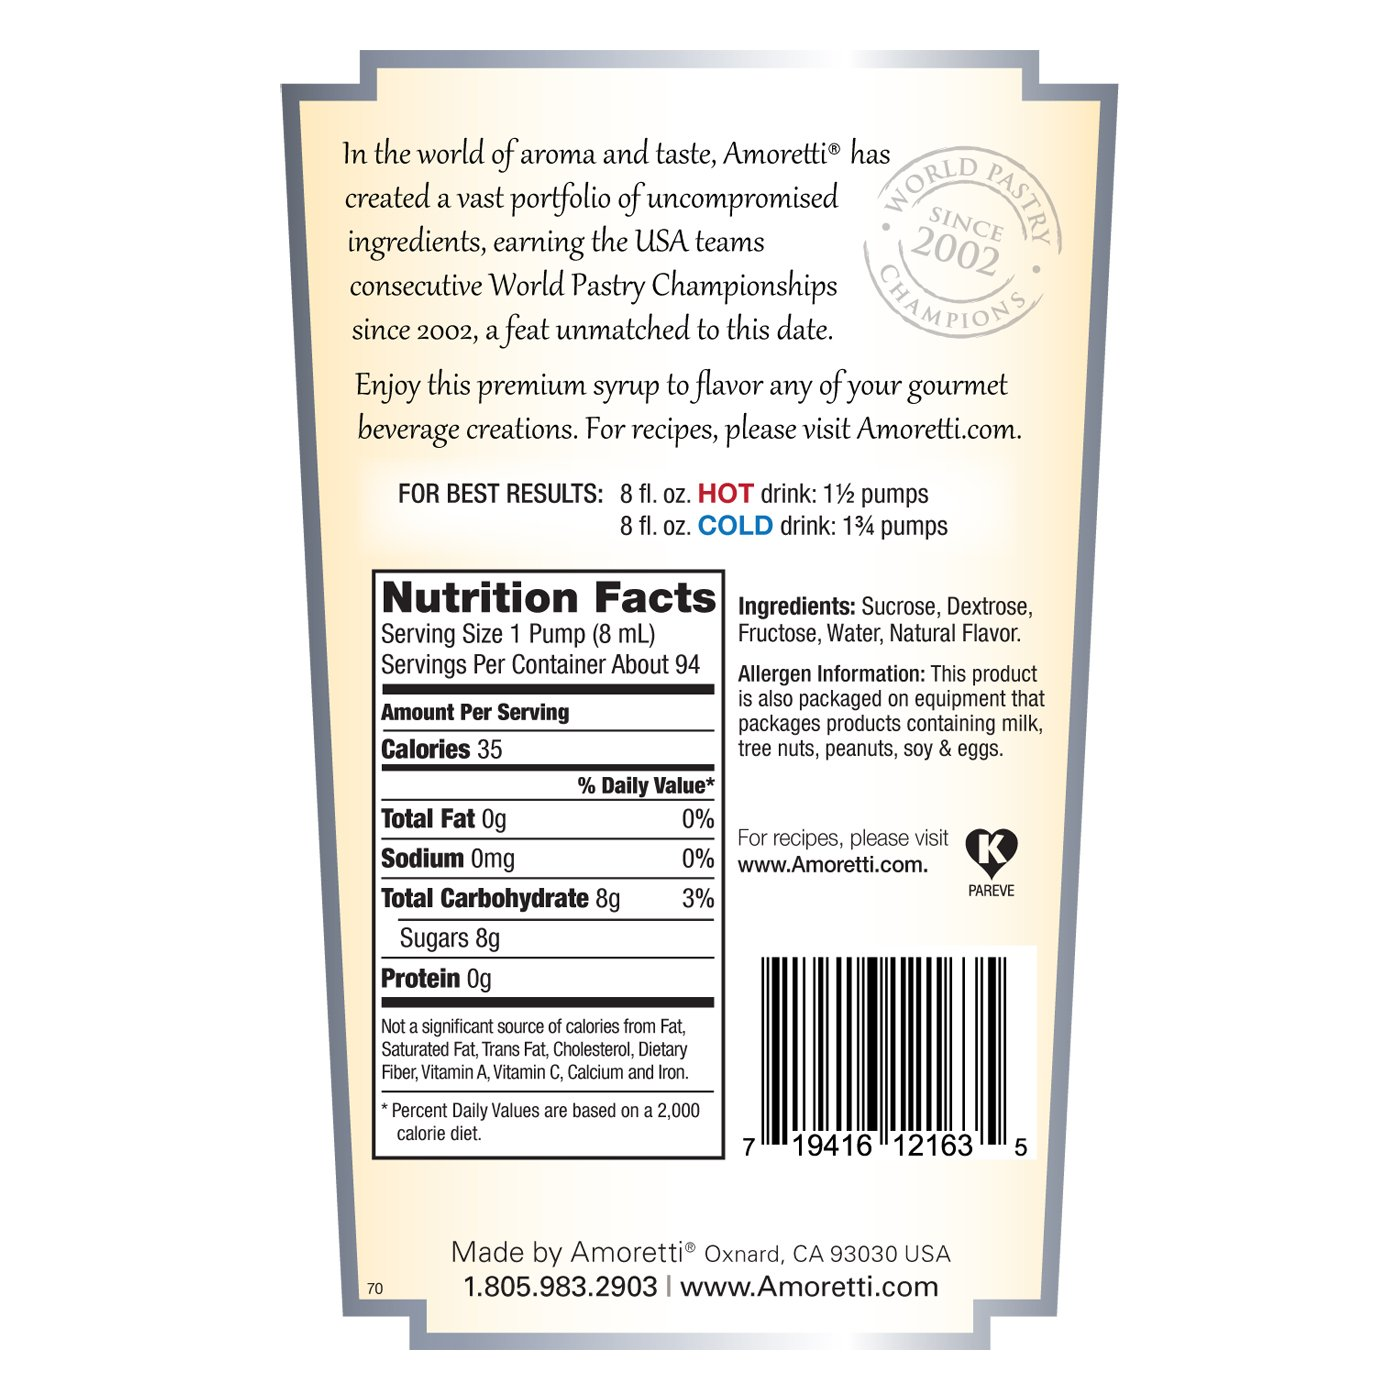 Amoretti Premium Syrup, Irish Cream, 25.4 Ounce by Amoretti (Image #2)